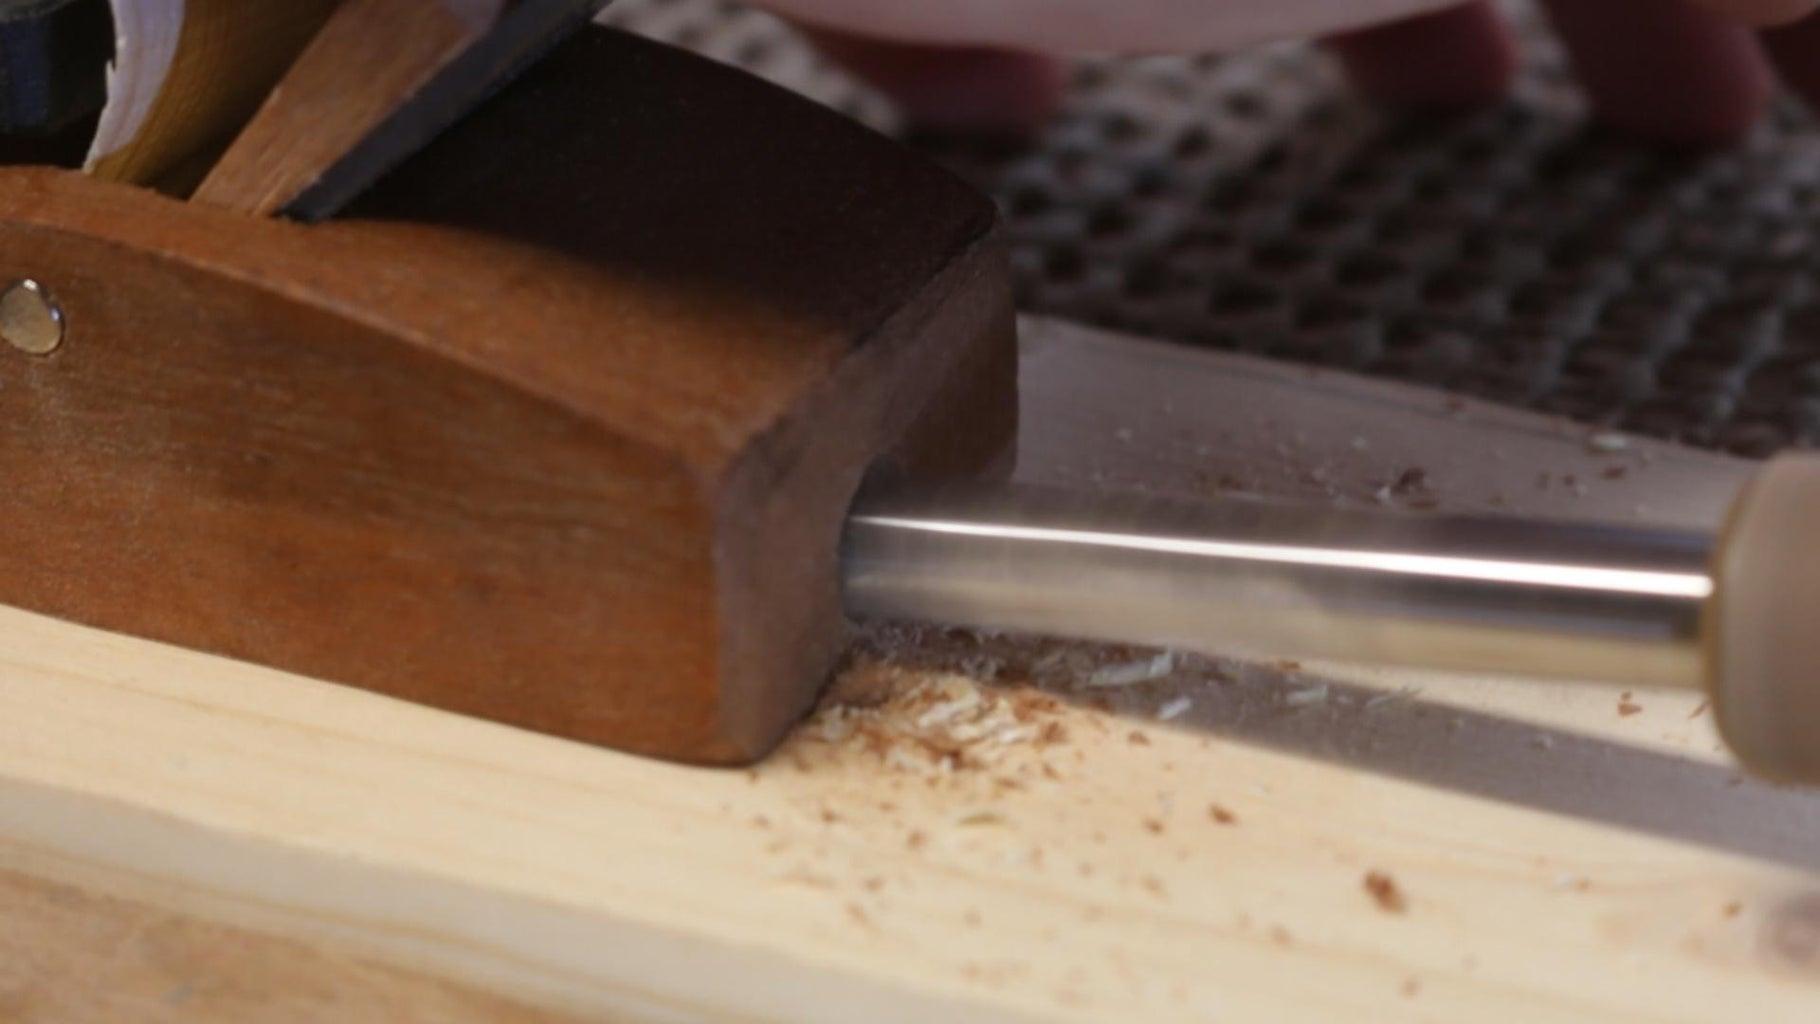 How the Hidden Pocket Hole Jig Would Work